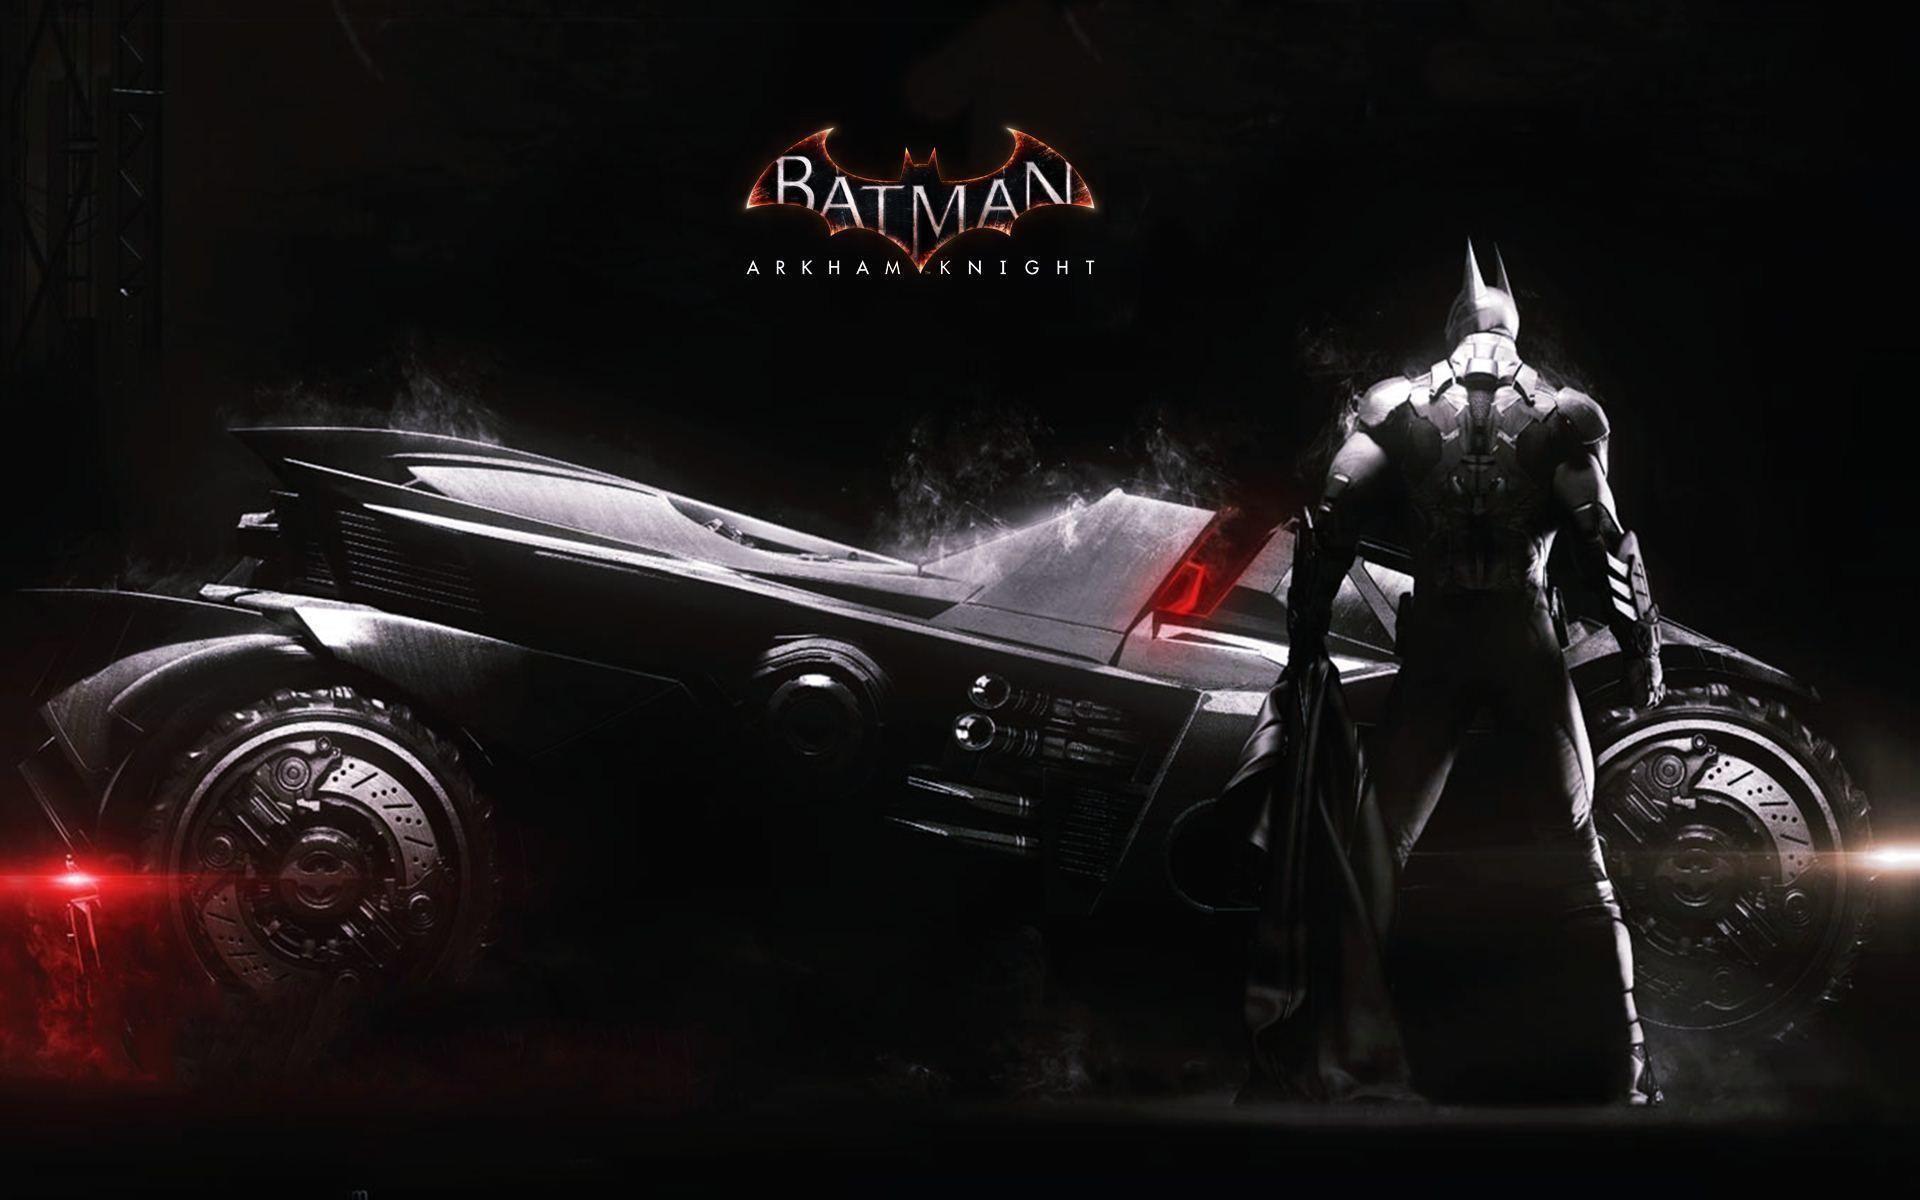 2014 Batman Arkham Knight Batmobile Exclusive HD Wallpapers #